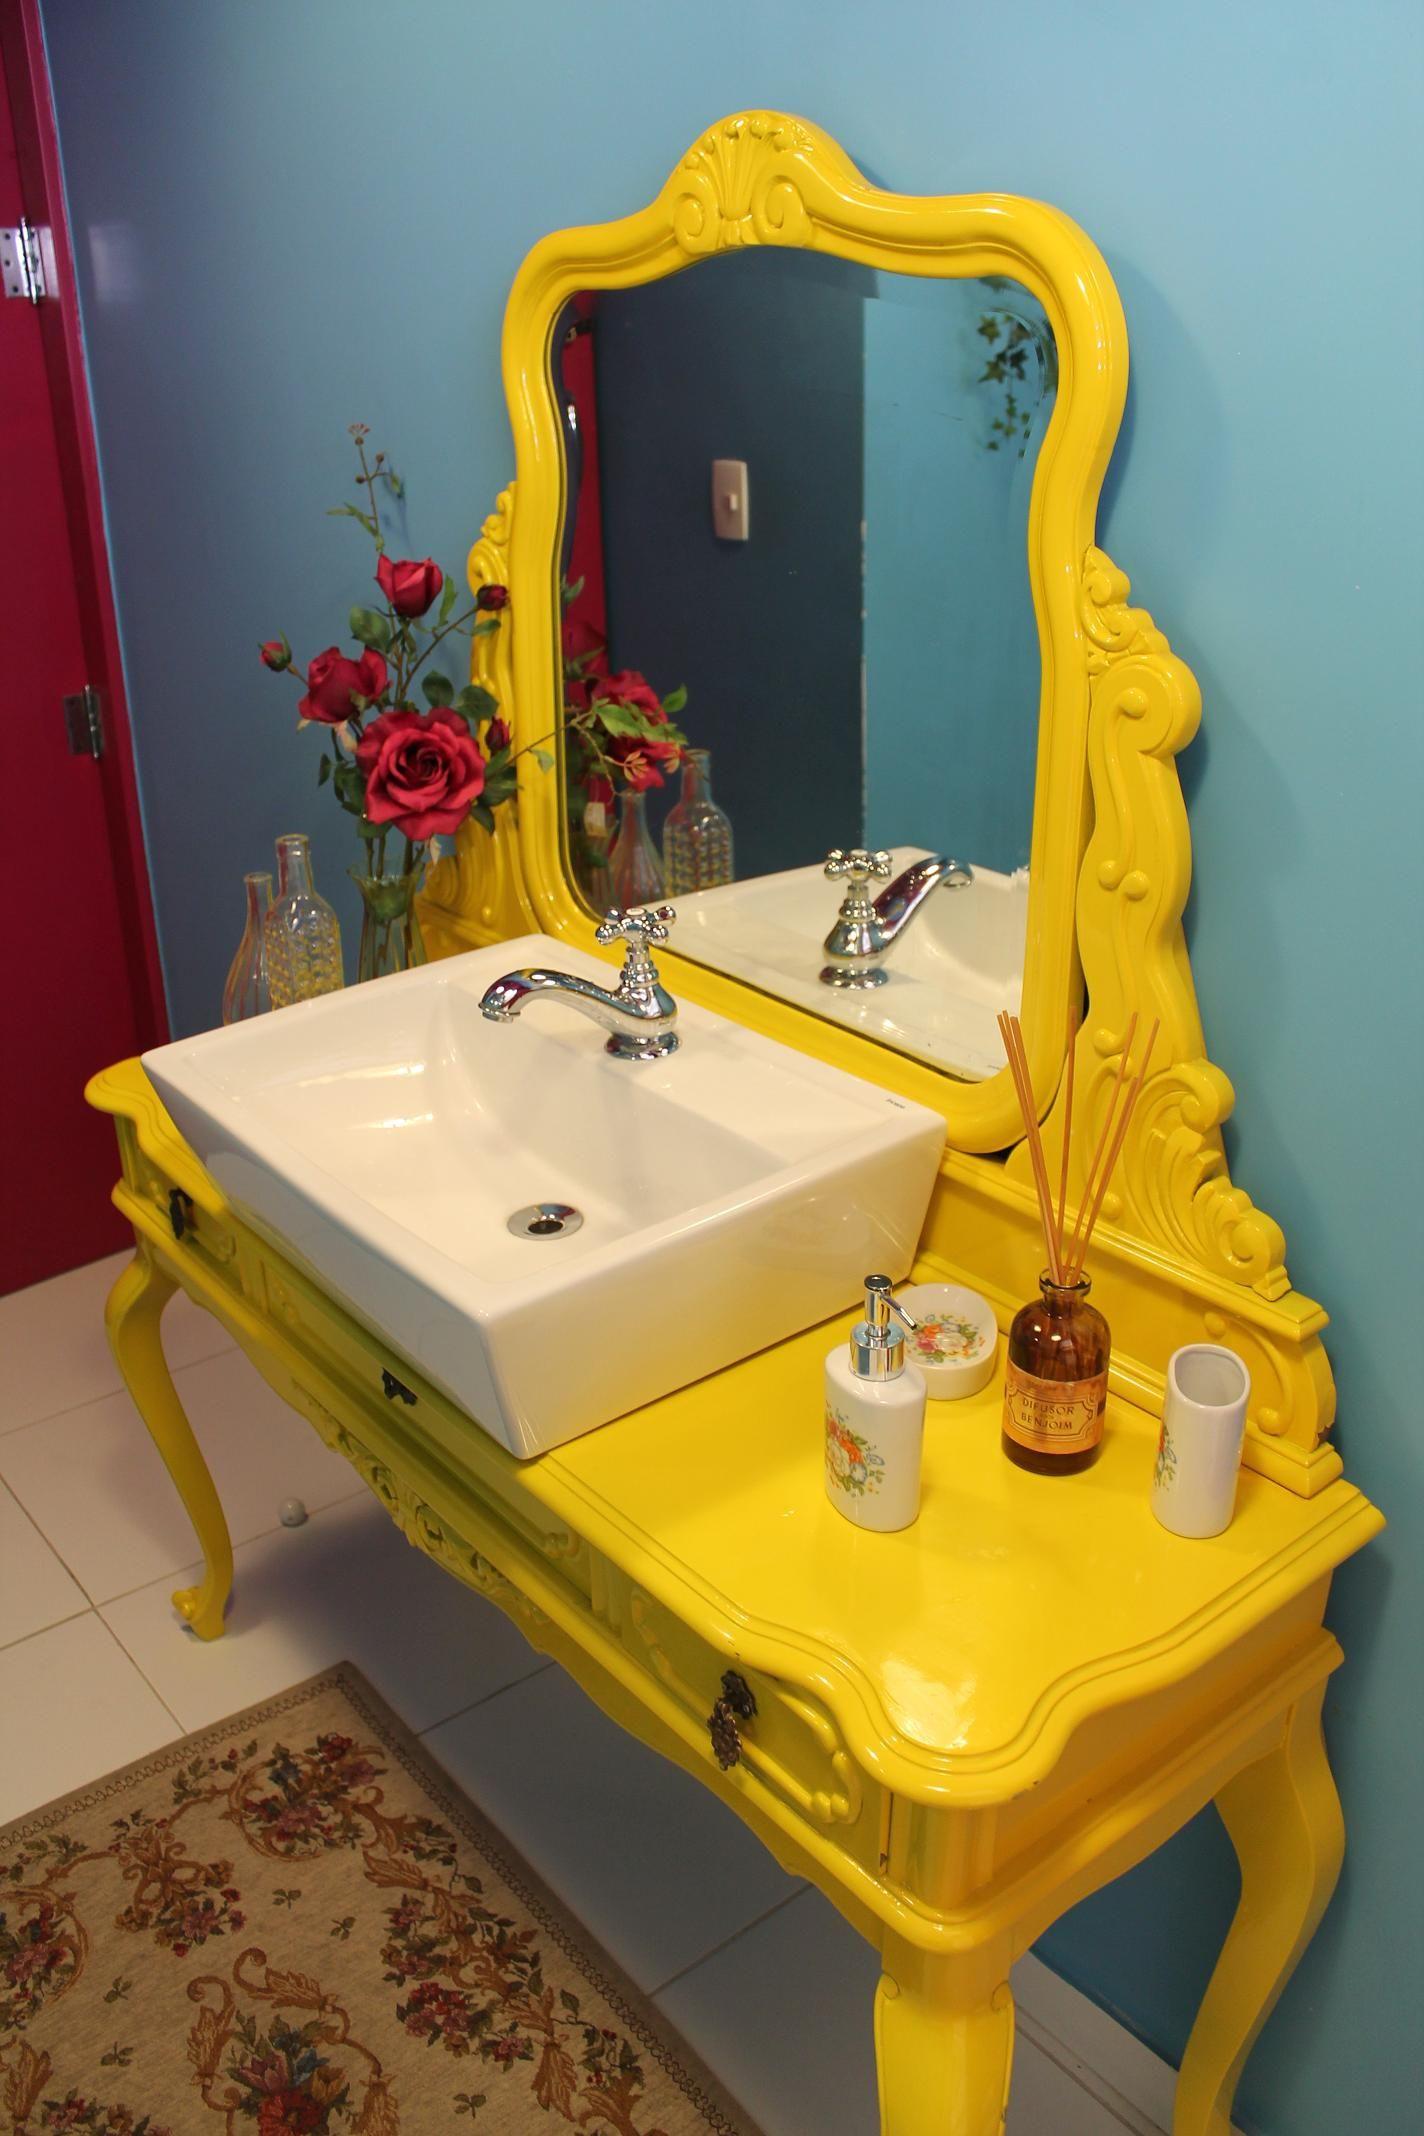 Badezimmer dekor gelb upcycled makeup vanity  beautiful decor  pinterest  badezimmer